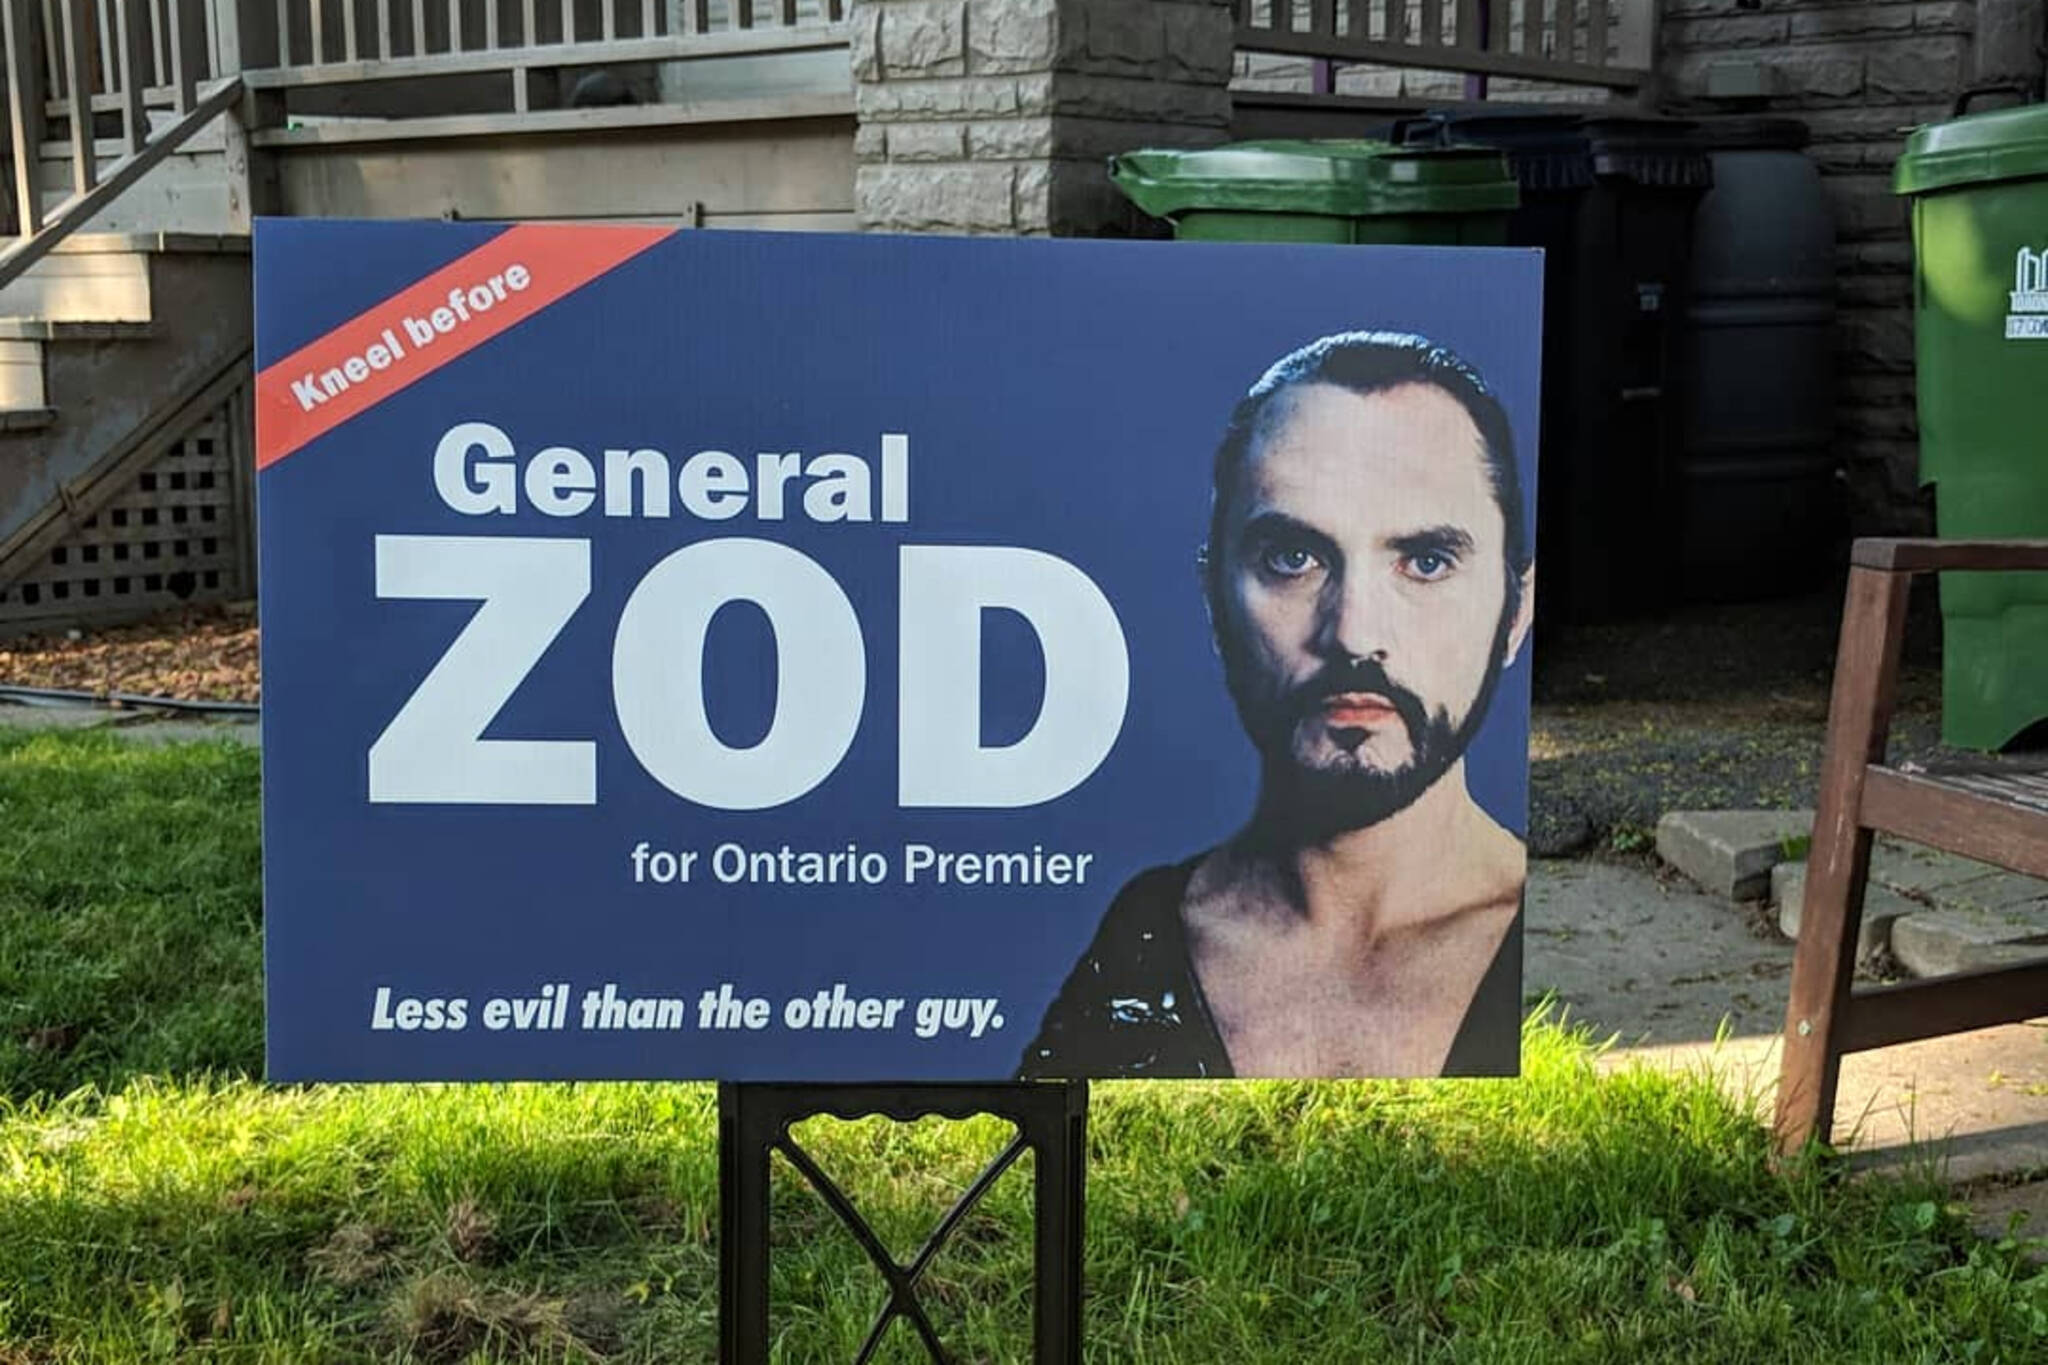 General Zod Premier